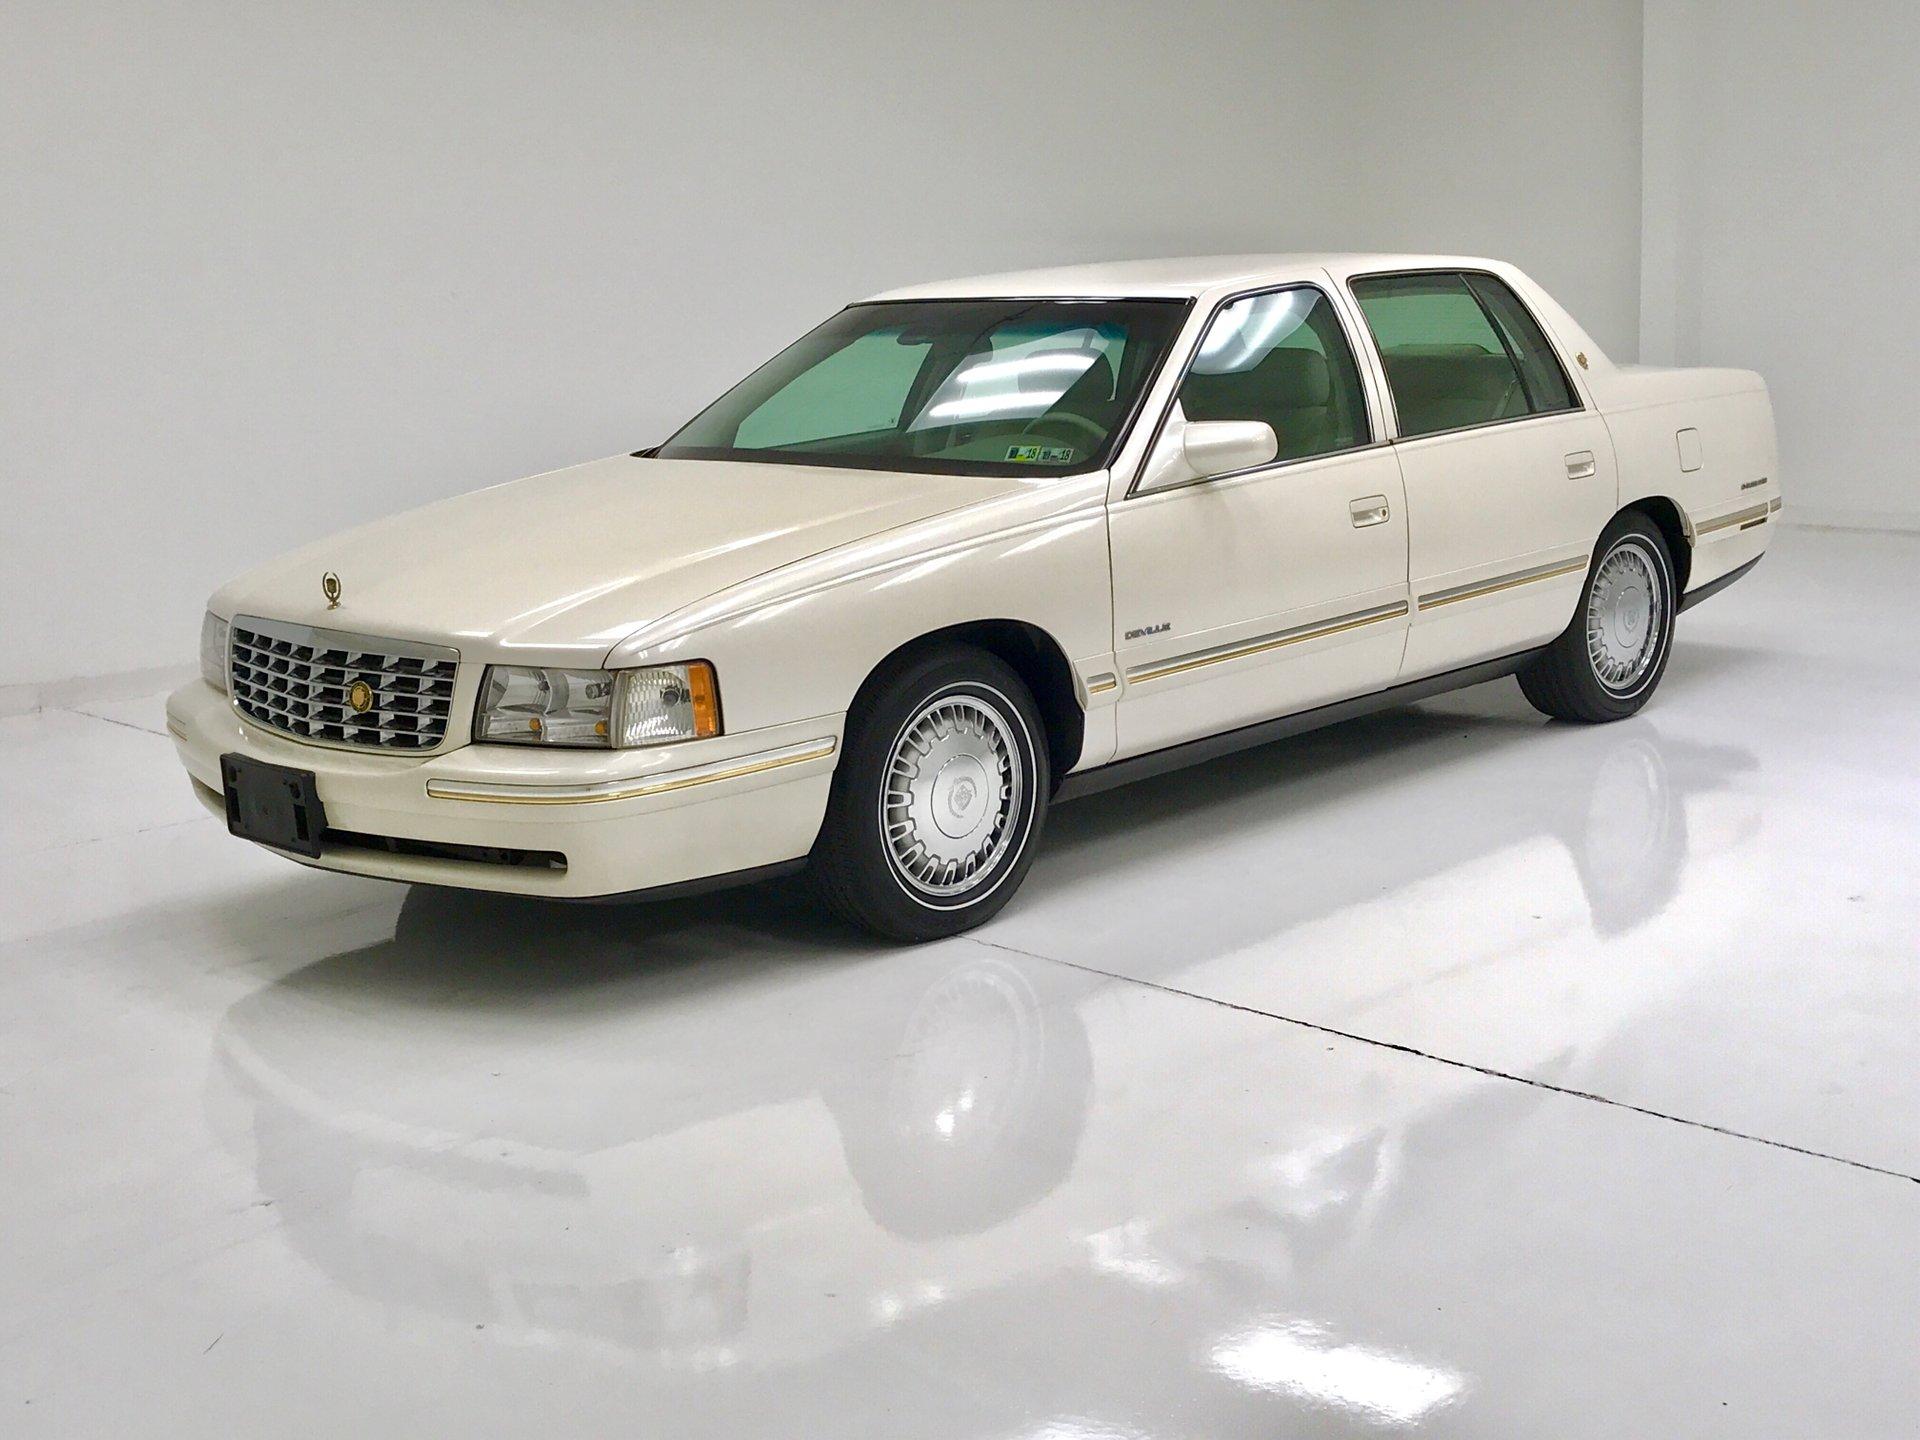 1999 Cadillac Sedan DeVille